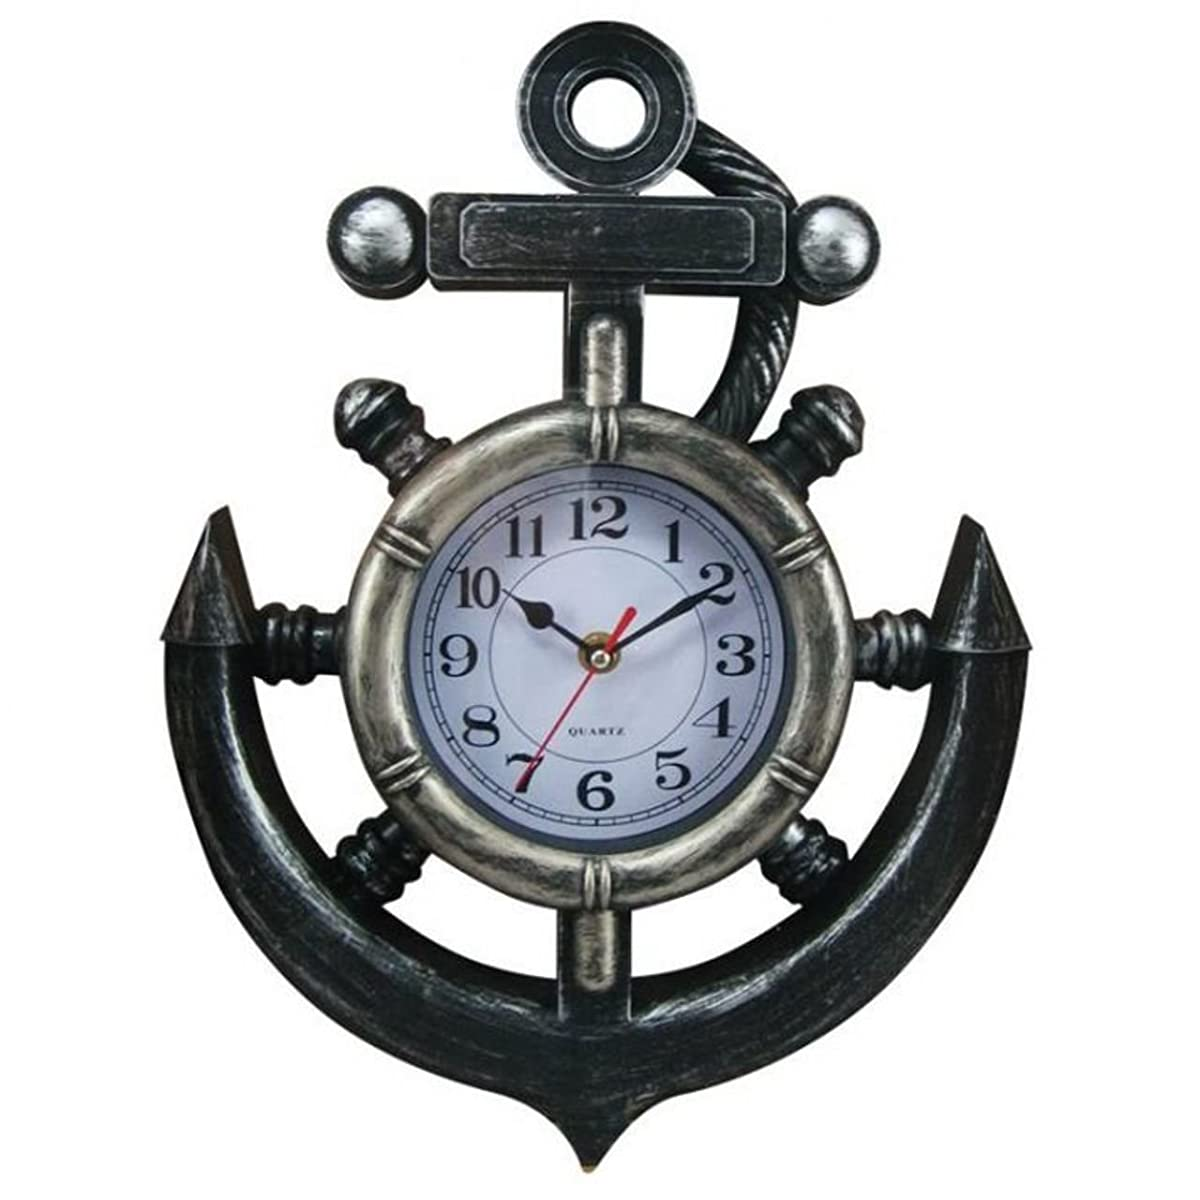 "Hampton Nautical Y-67039 Decorative Pewter Ship Wheel & Anchor Wall Clock 15"" - Decorative Anchor - Nautical Clock"